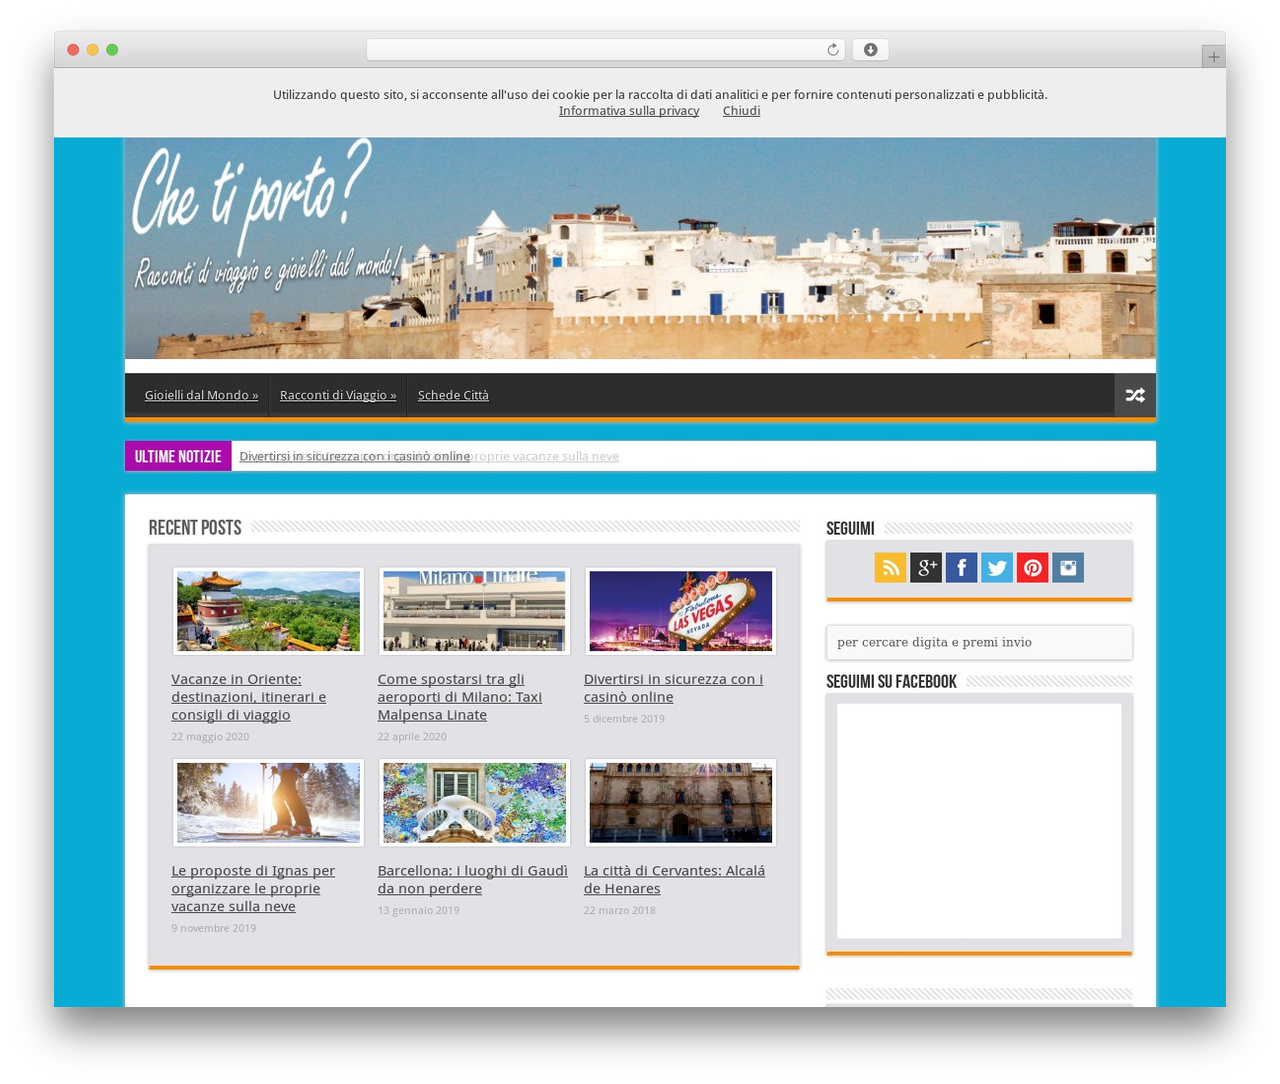 WordPress template Sahifa - chetiporto.it